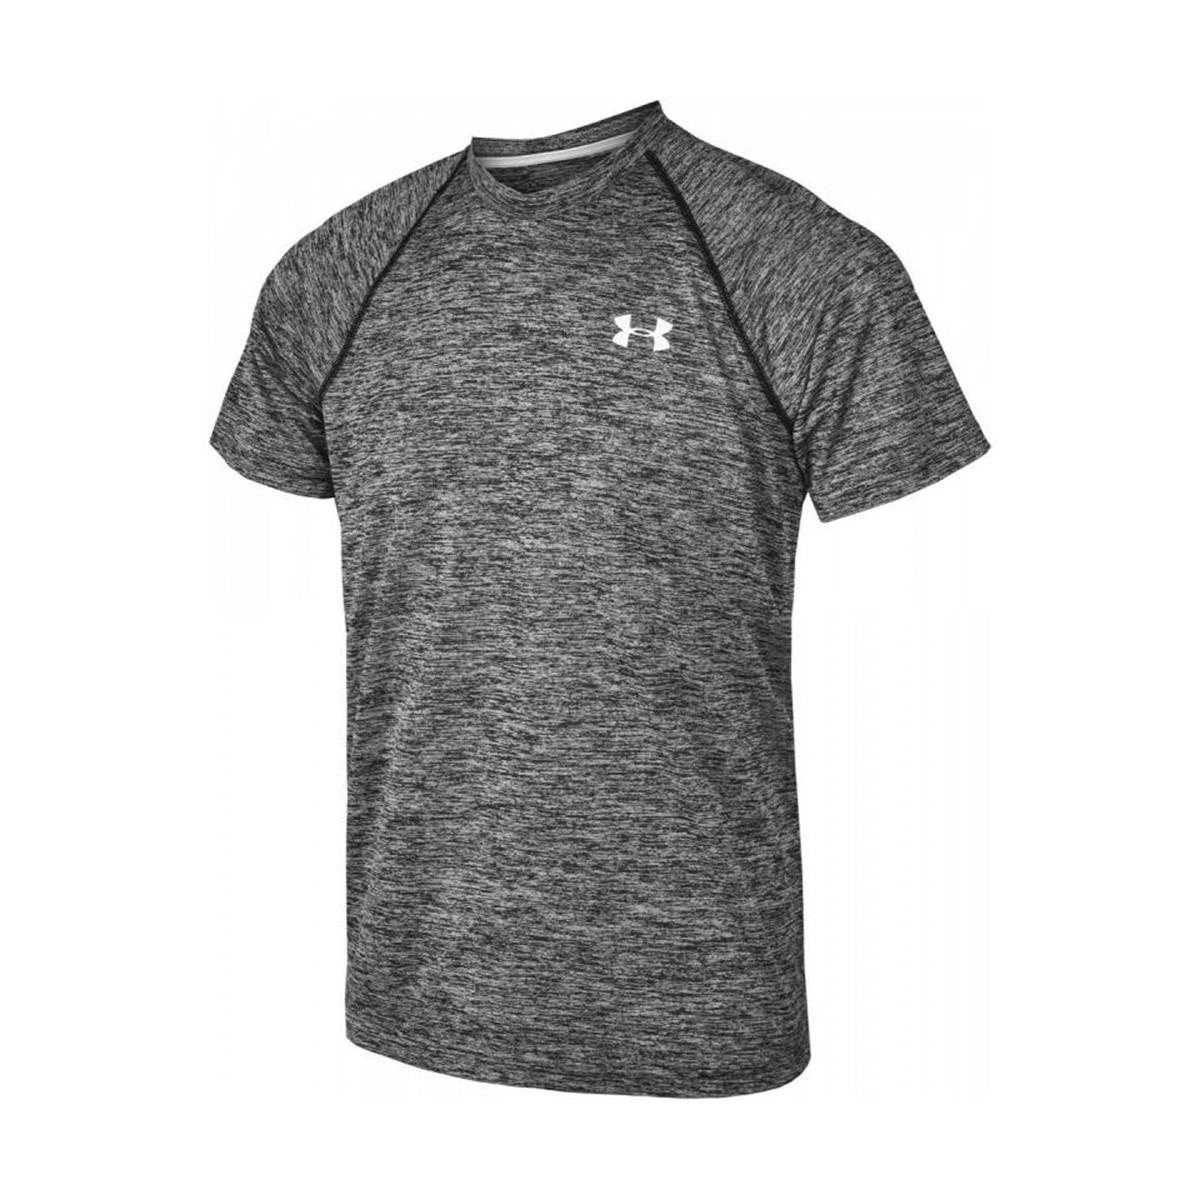 Lyst under armour tech short sleeve tshirt m men 39 s t for Gray under armour shirt